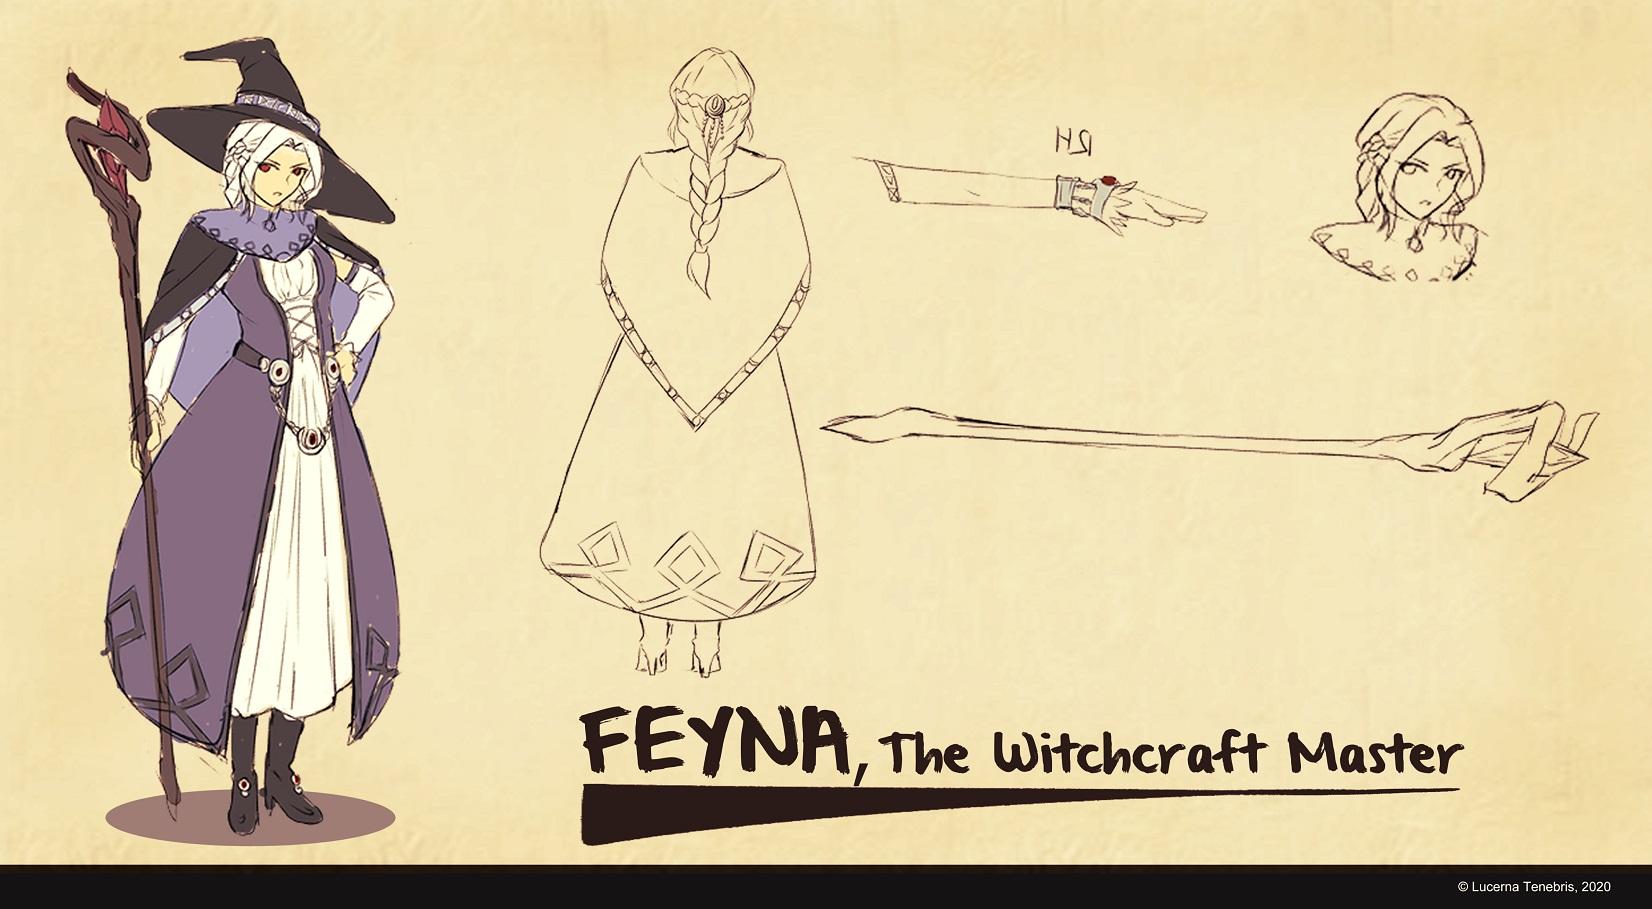 Feyna, The Witchcraft Master